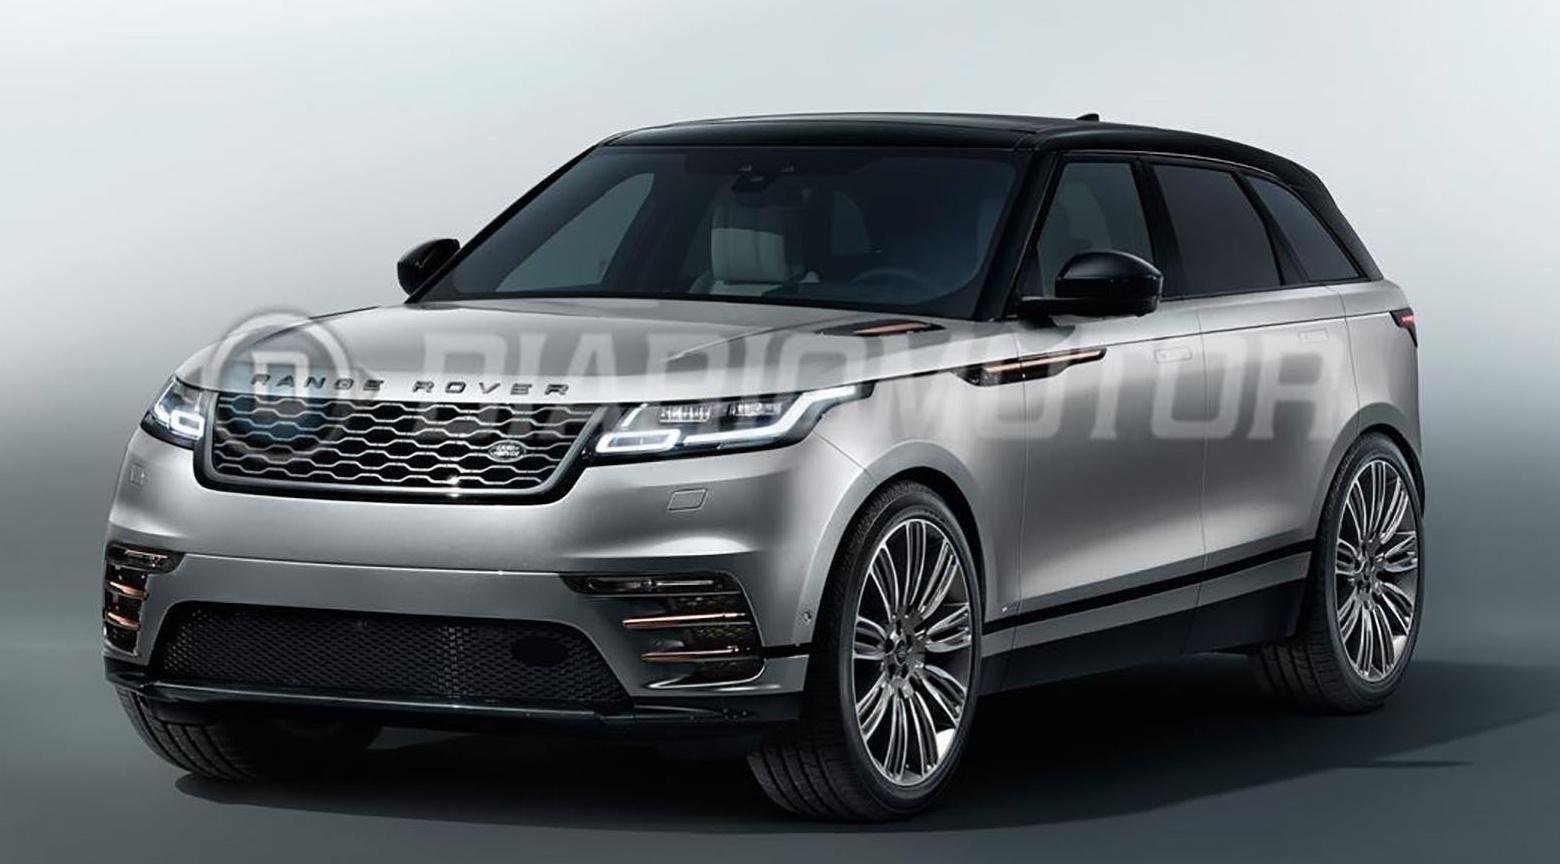 New Range Rover Velar Revealed In Leaked Images Forcegt Com